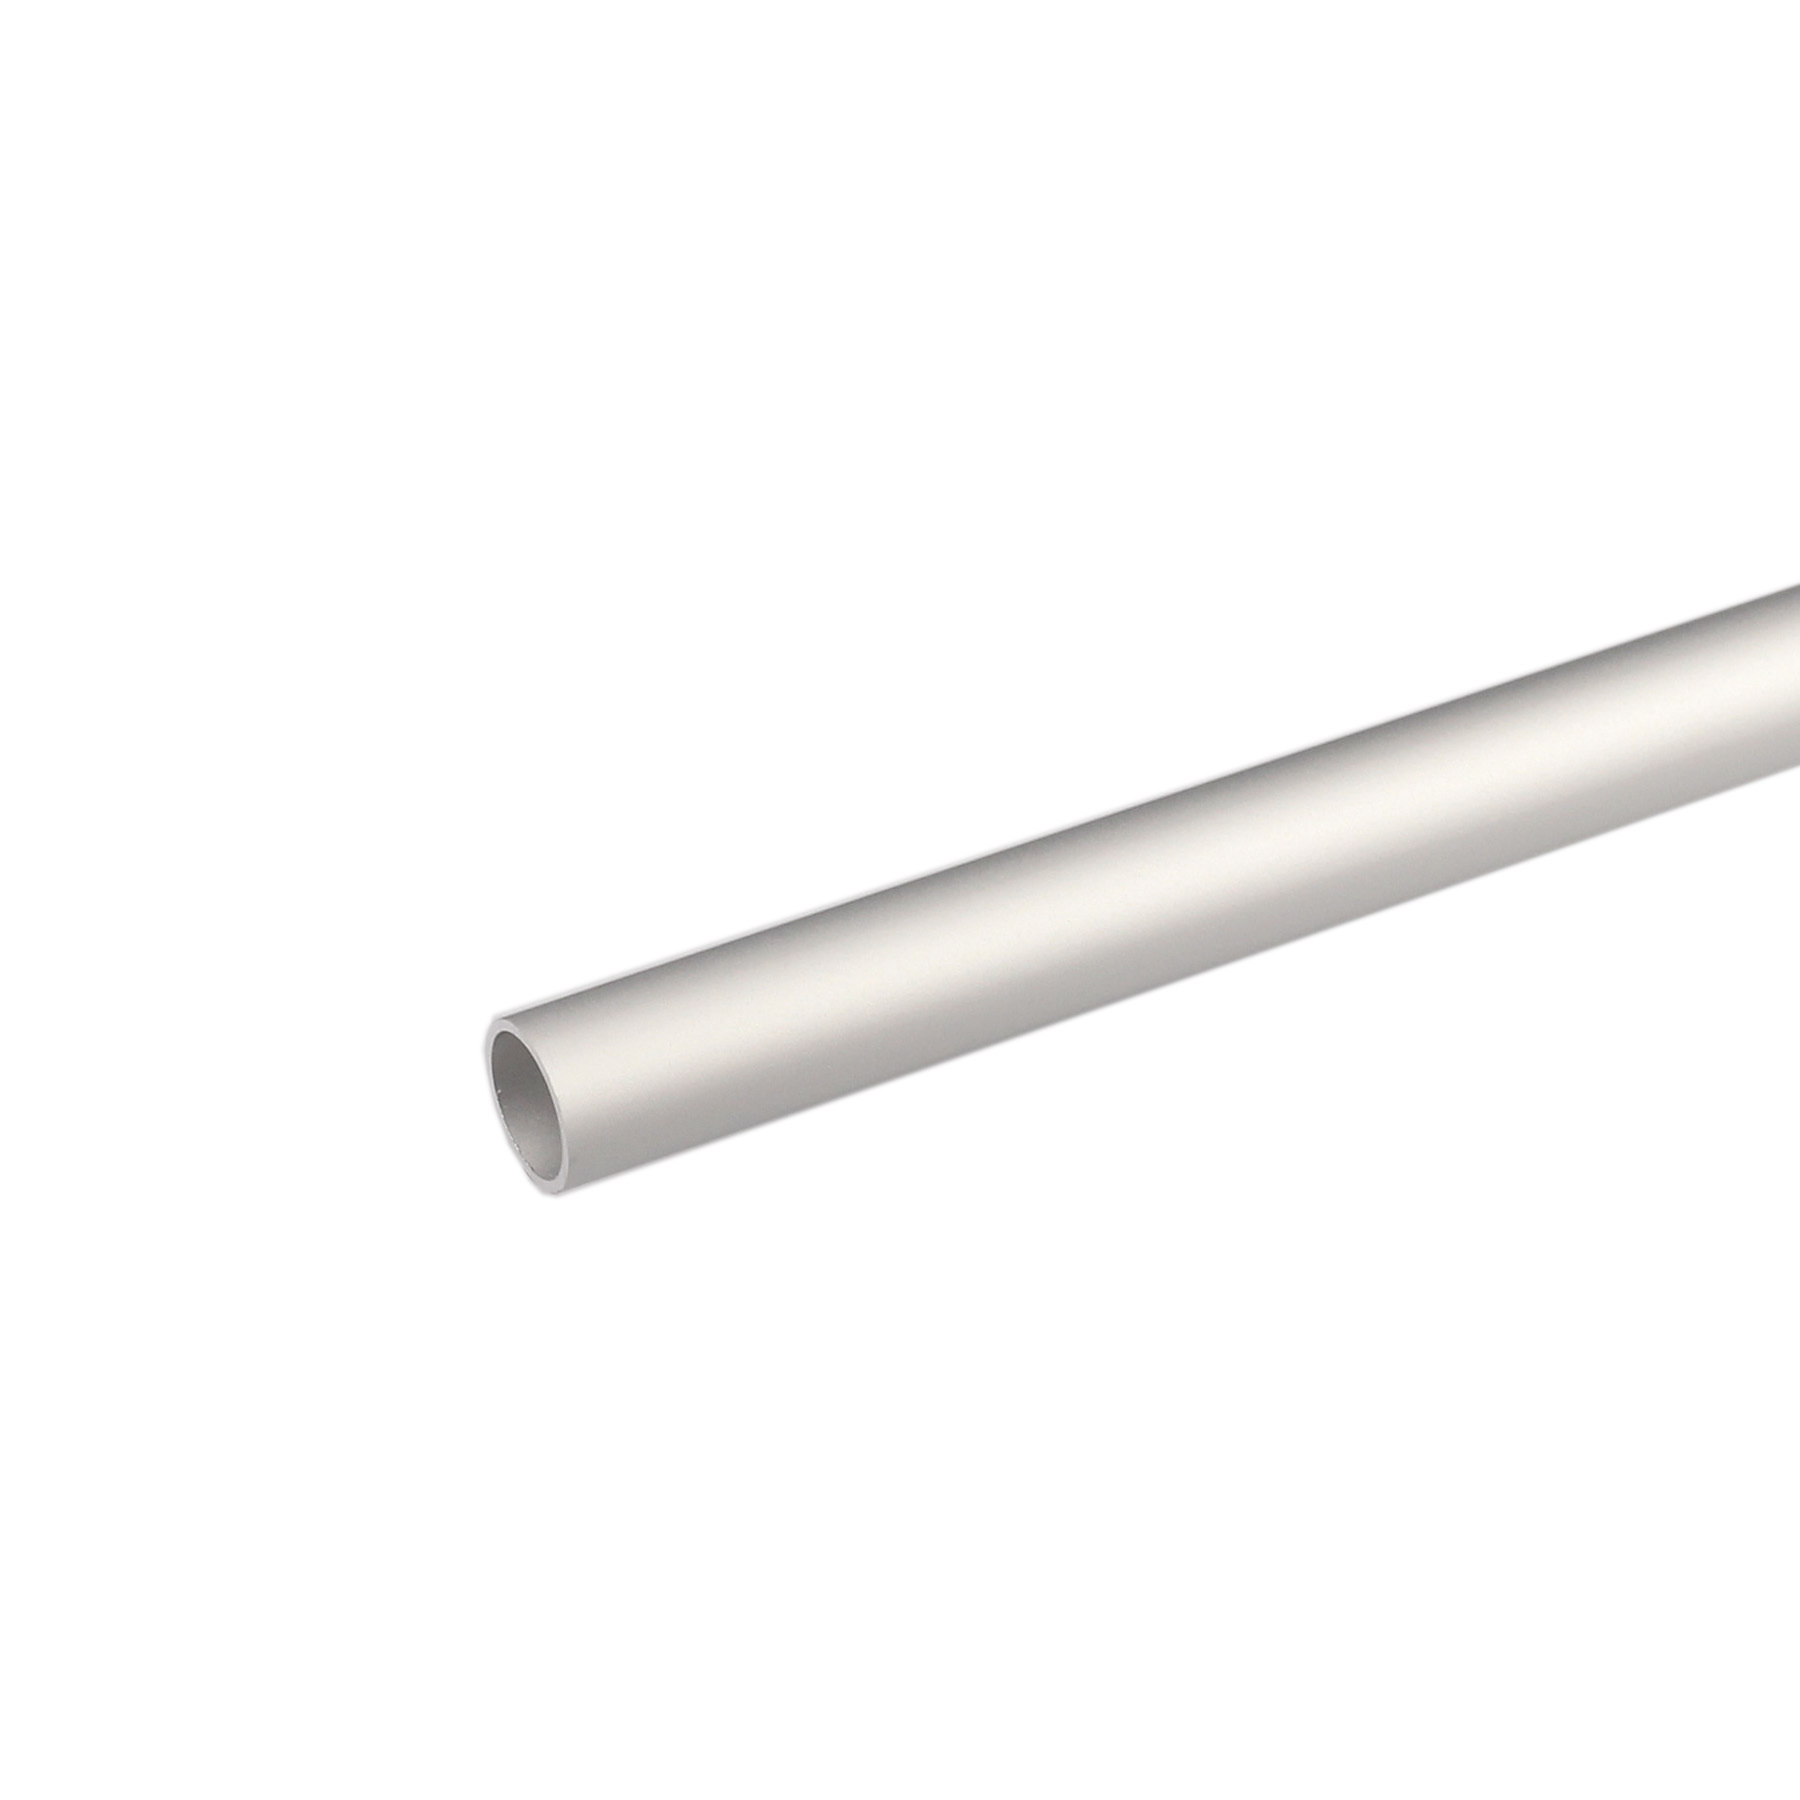 Perfil alum nio tubo redondo 1mx12x1mm anodizado leroy for Perfil u aluminio leroy merlin